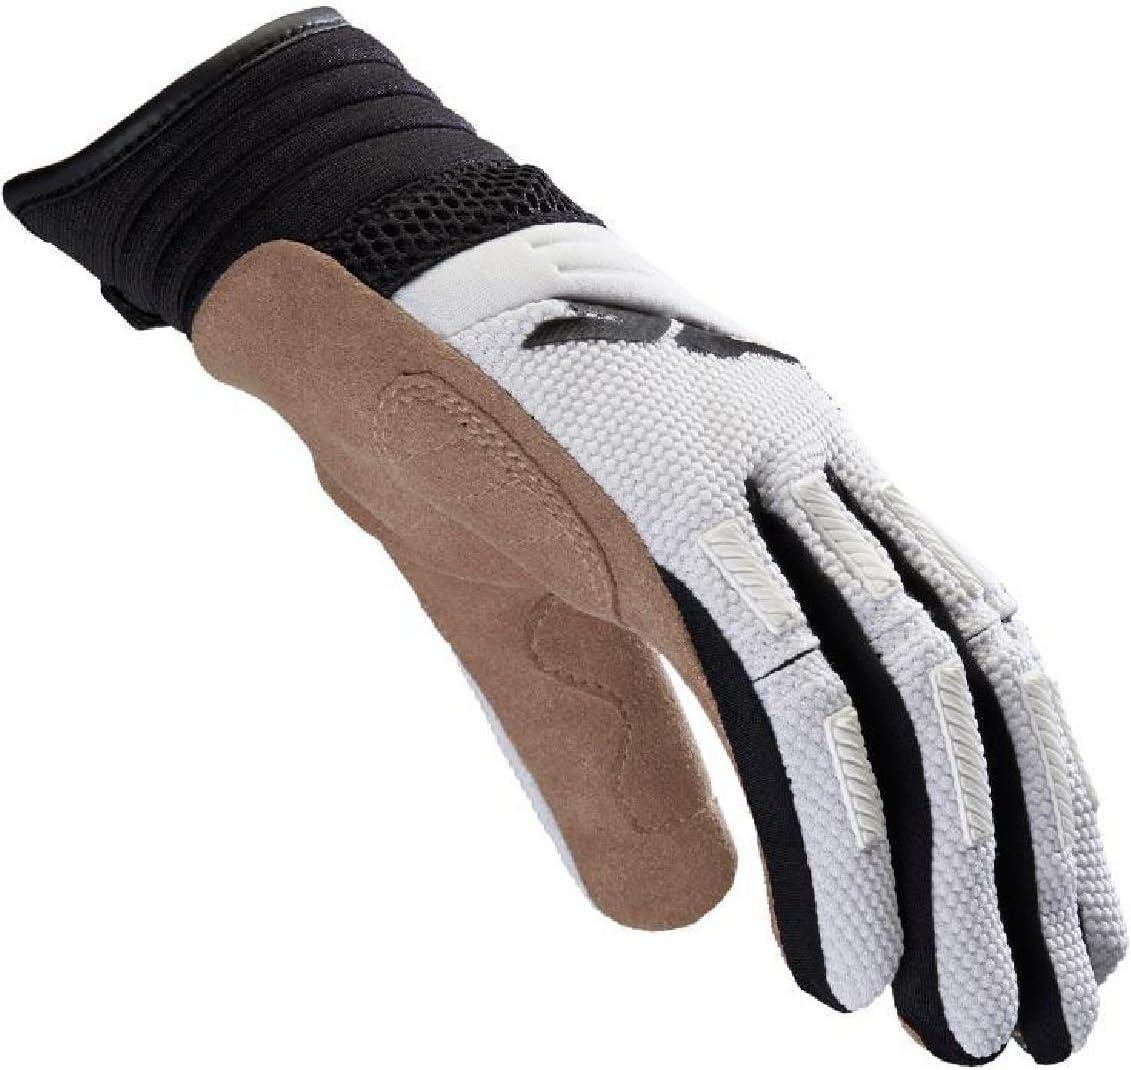 Size M SPIDI Mega-X Motorcycle Gloves Black